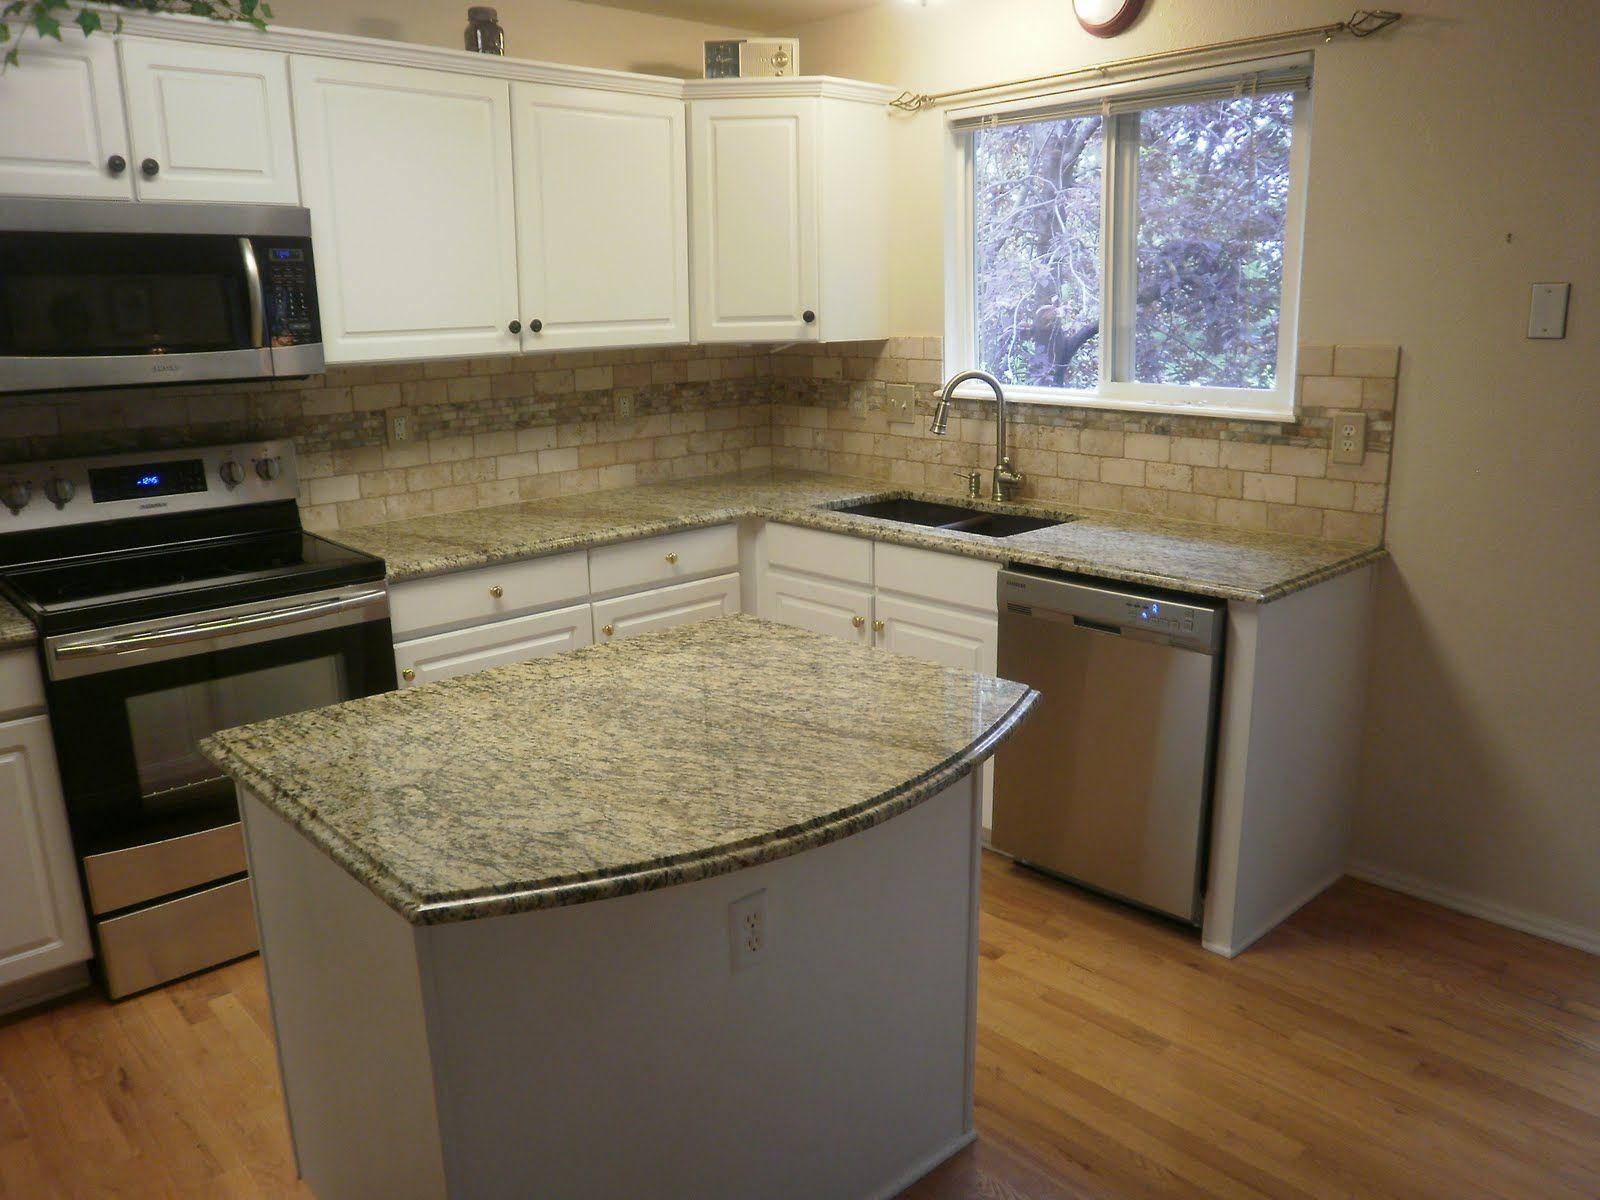 kitchen kitchen counters and backsplash Santa Cecilia granite countertops and travertine onyx backsplash